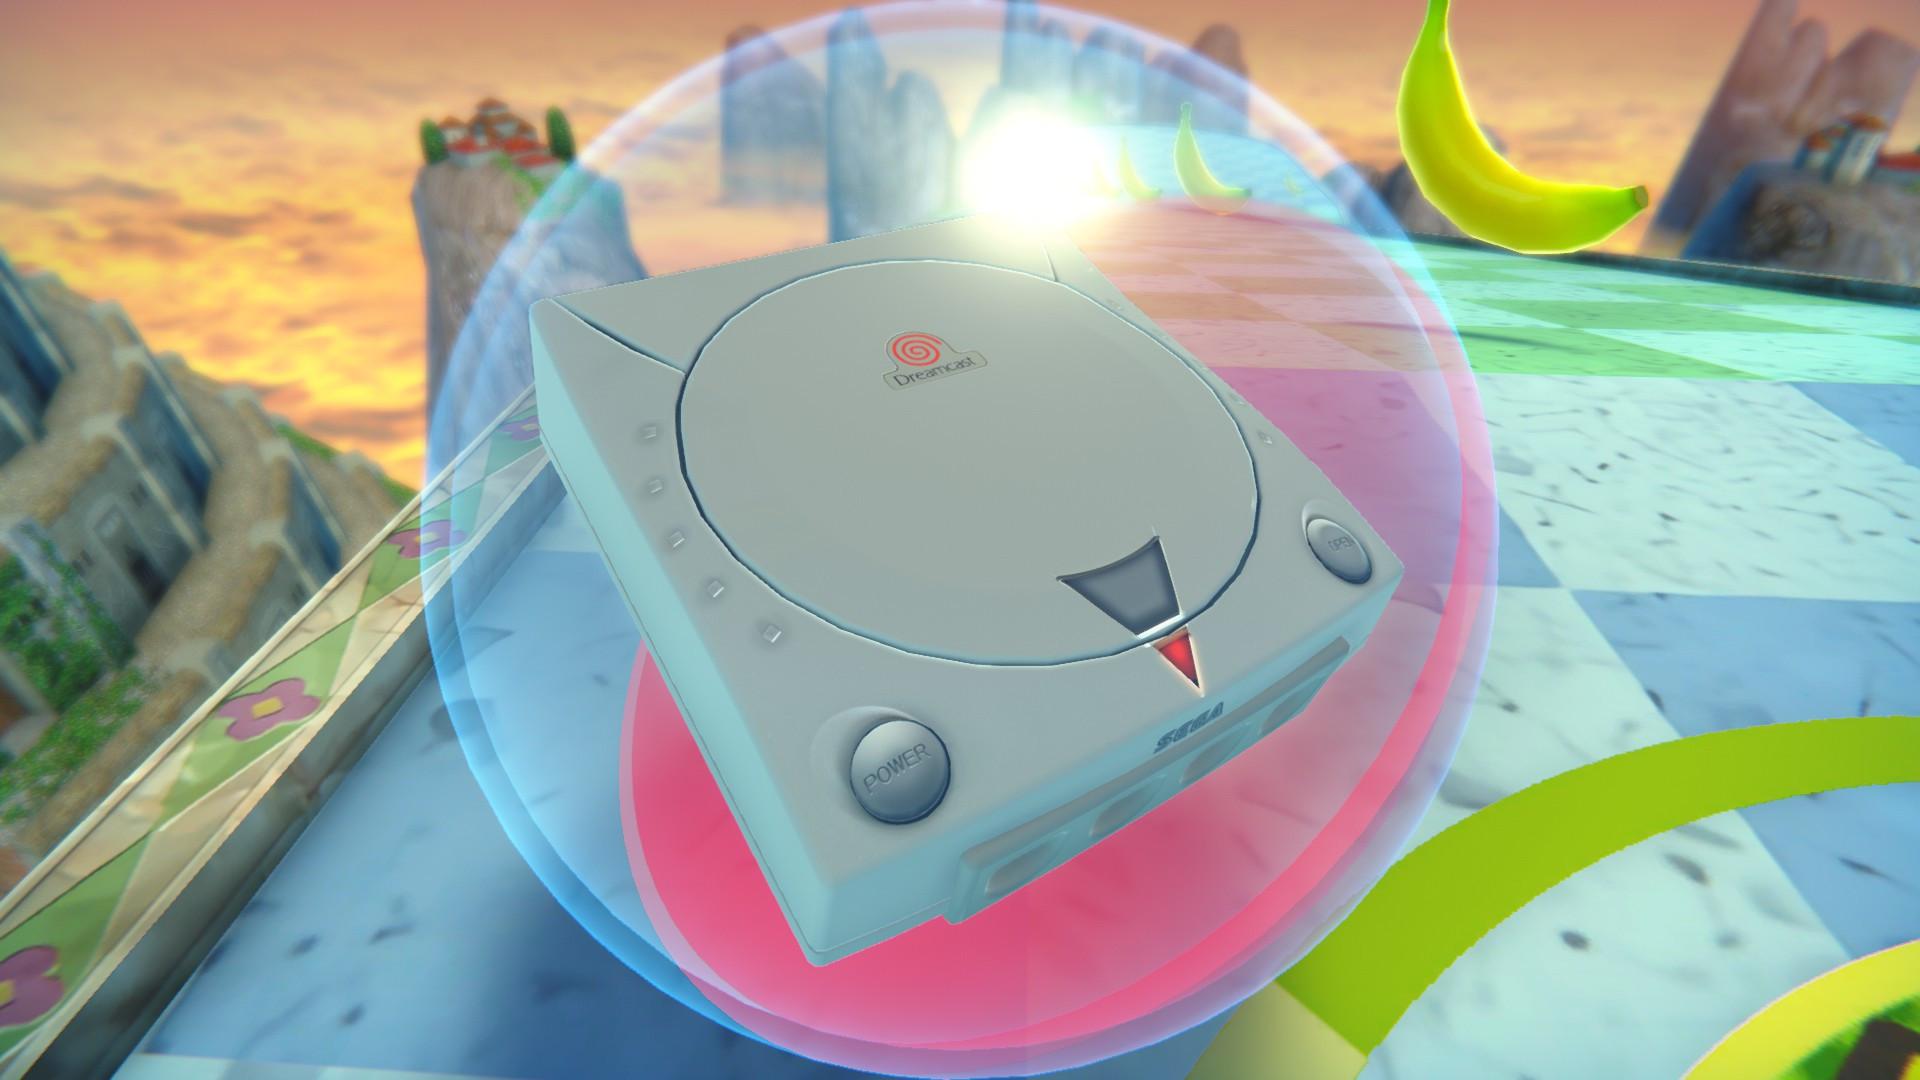 Super Monkey Ball Banana Mania - Game Config Visual Quality Settings - • The Modding Scene [WIP] - 014C811